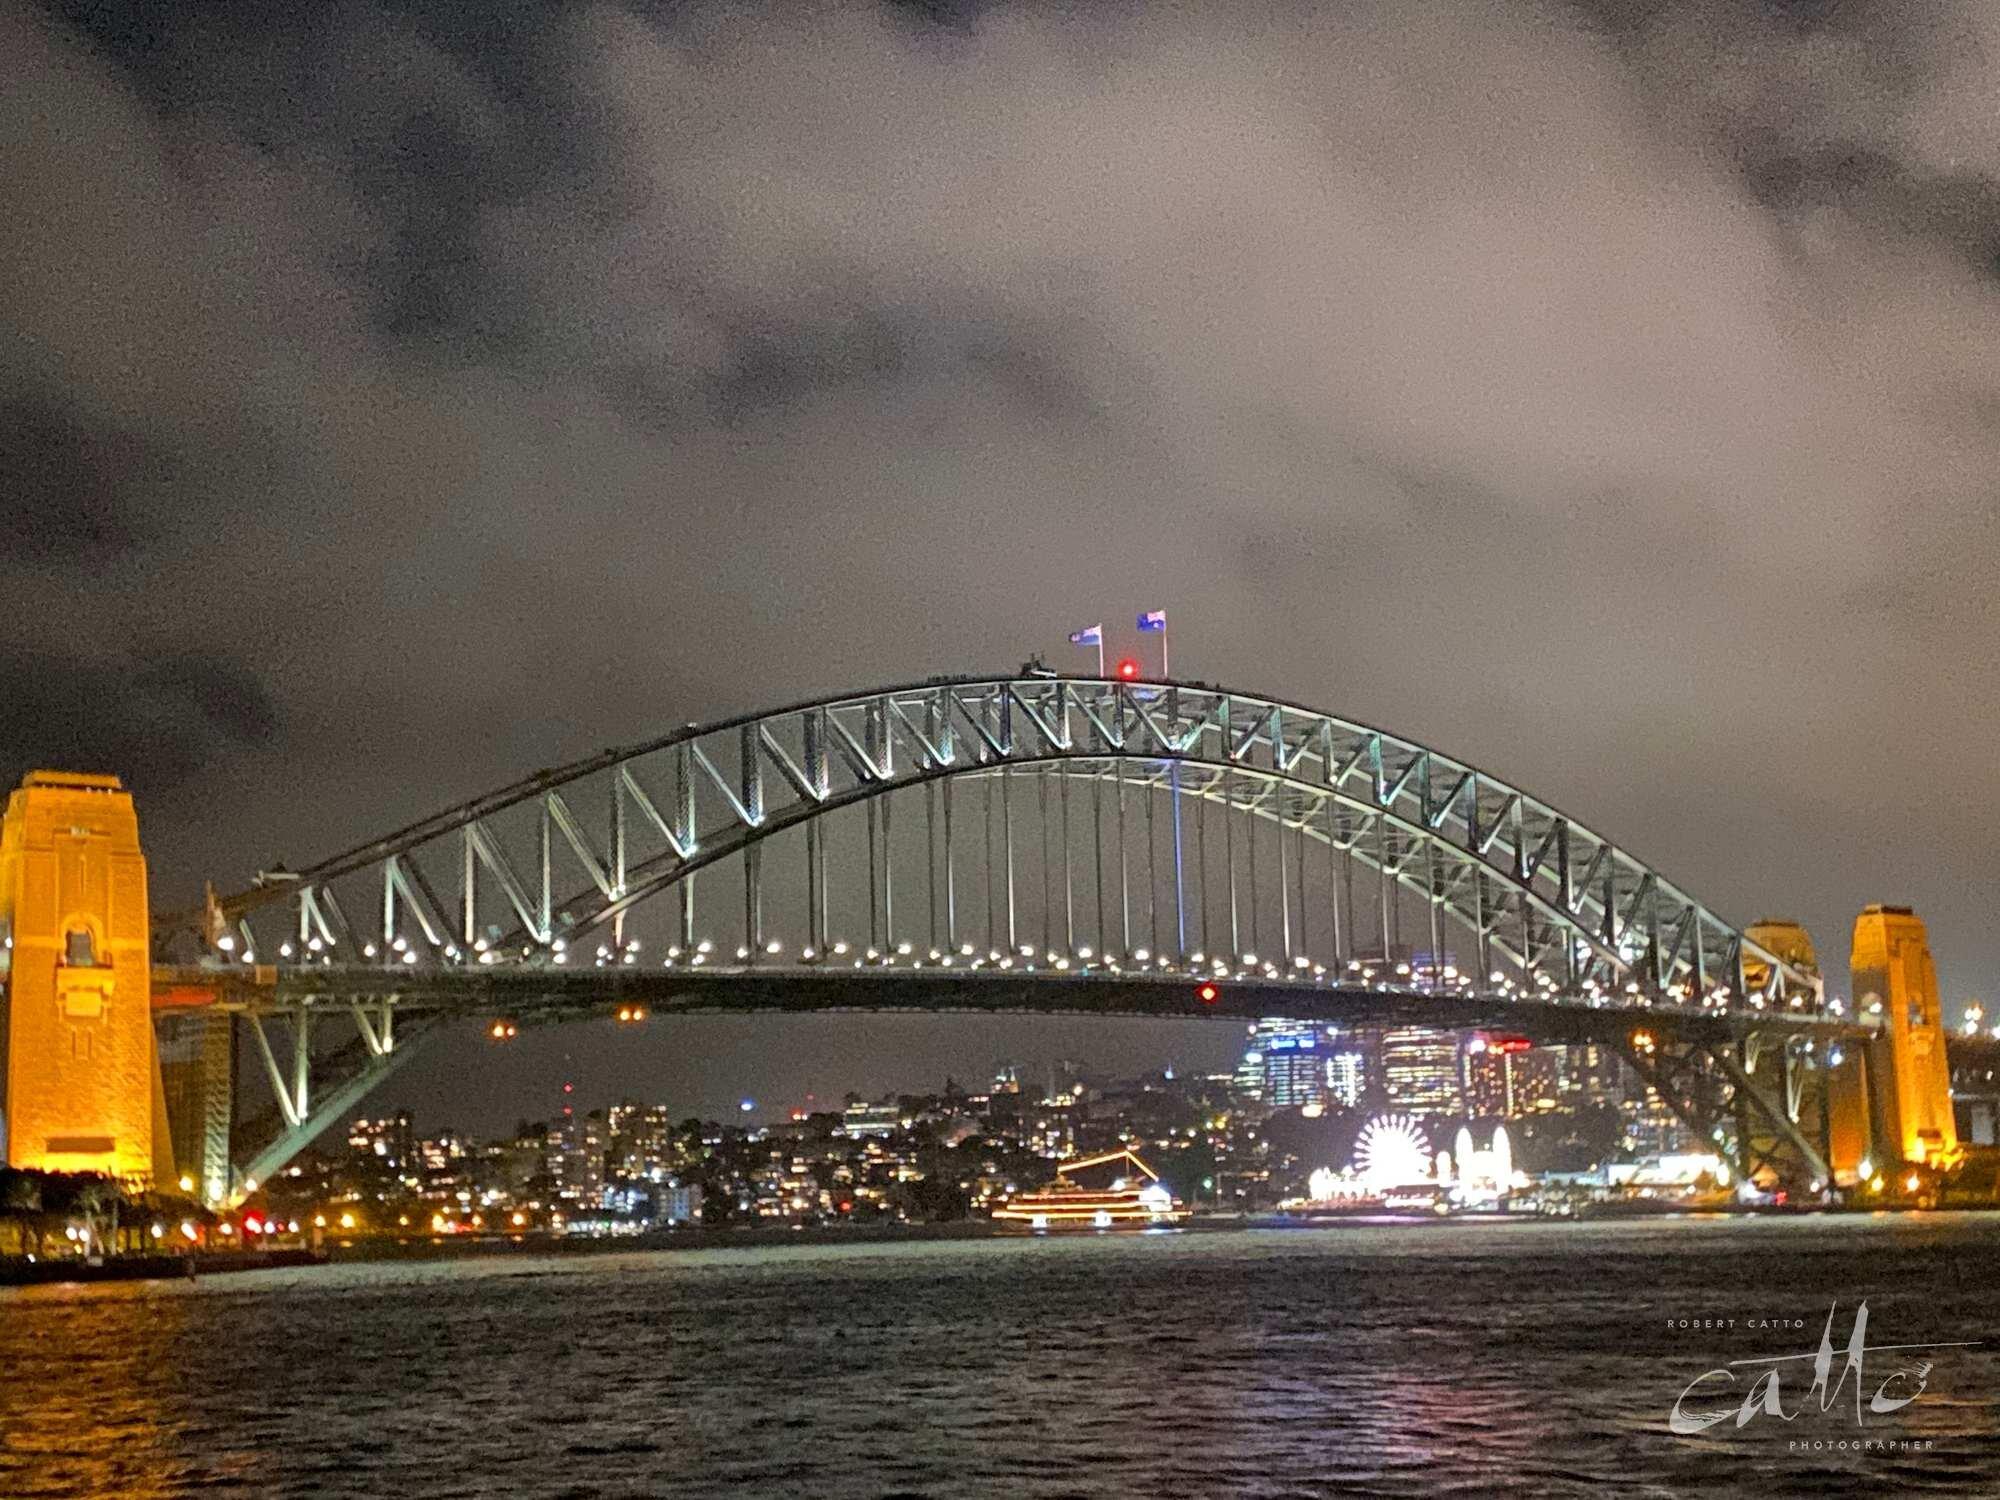 Sydney Harbour Bridge at night (2x zoom lens)